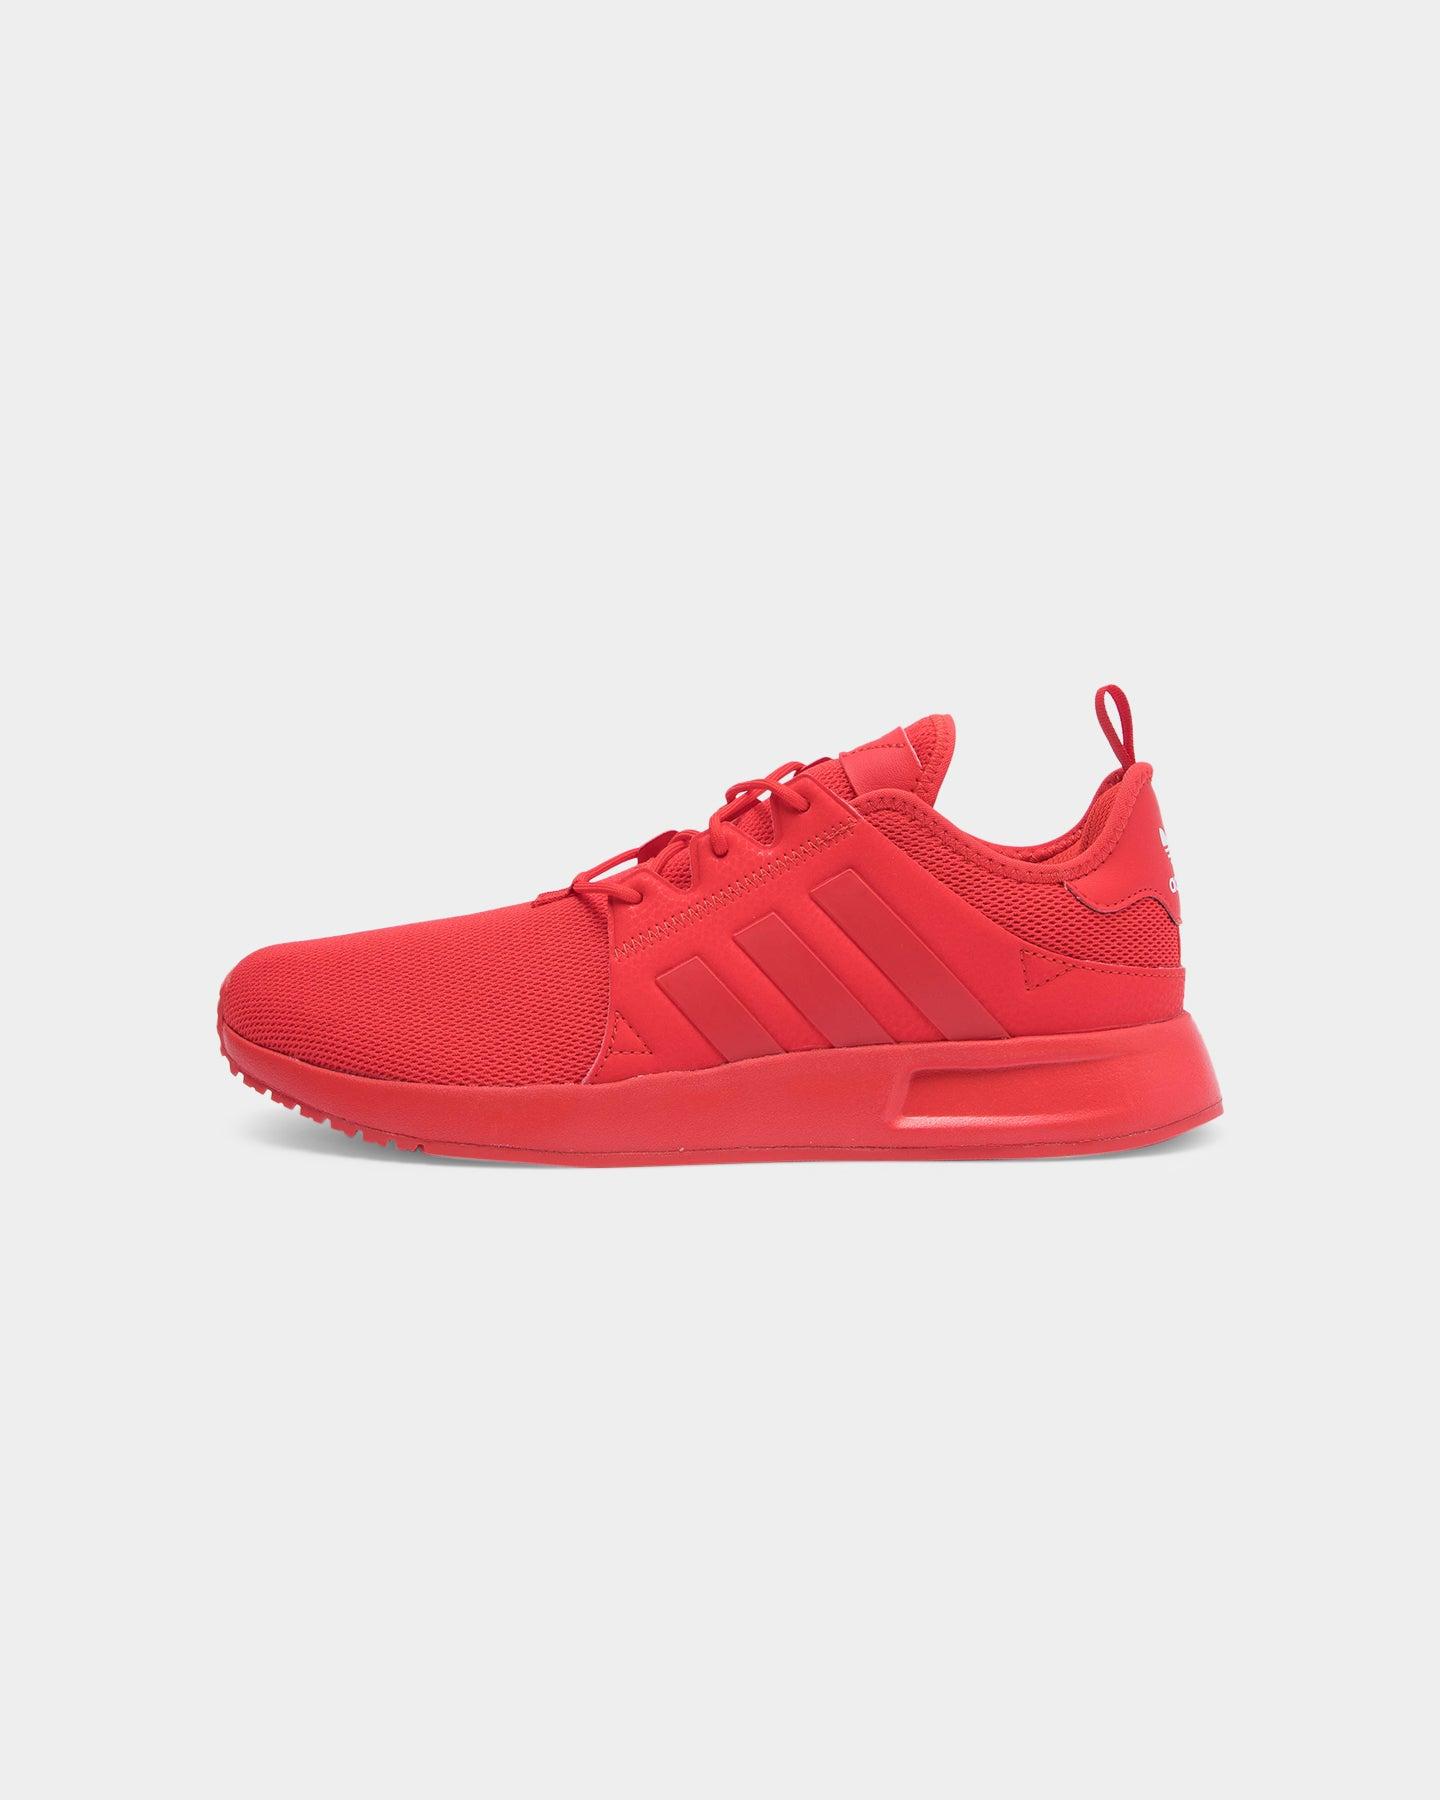 Adidas X_PLR Triple Red | Culture Kings US